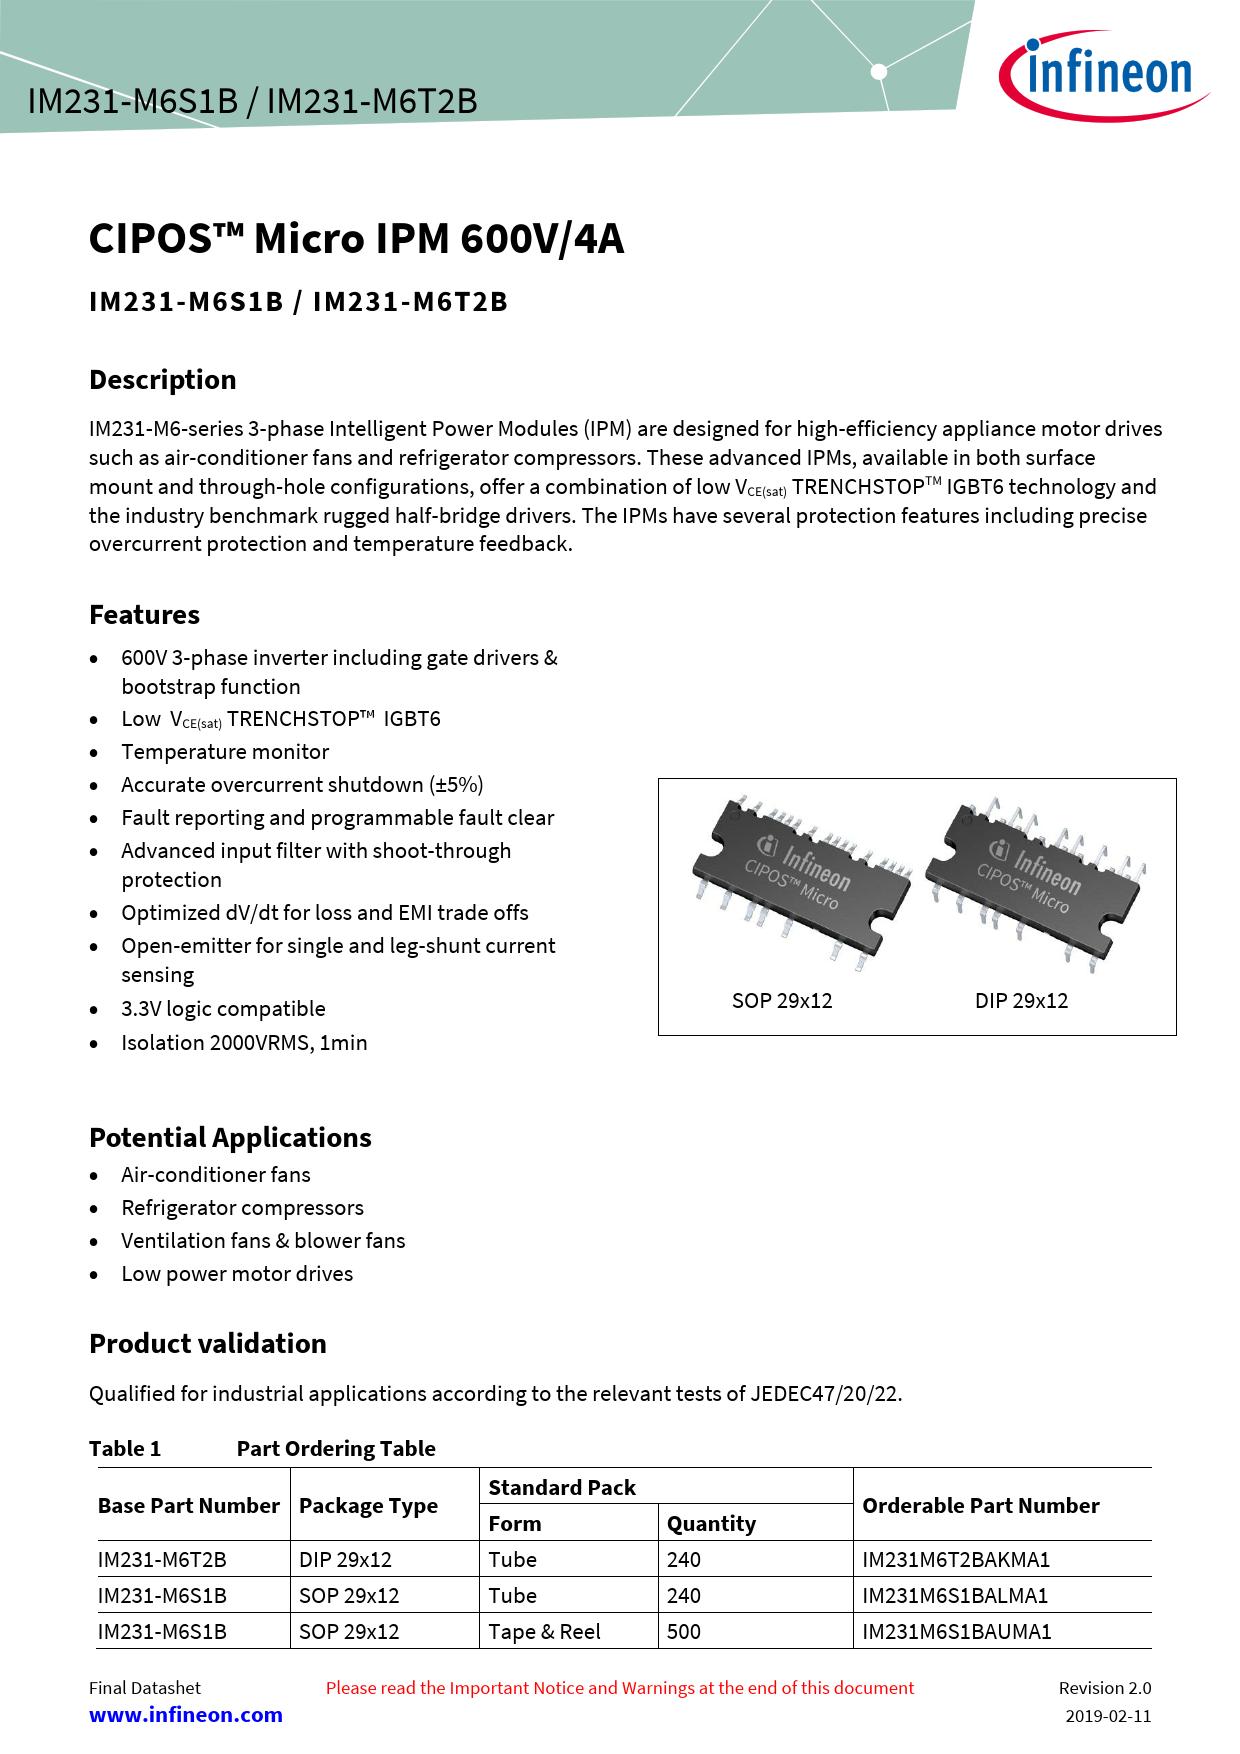 Datasheet IM231-M6S1B / IM231-M6T2B Infineon, Revision: 02_00